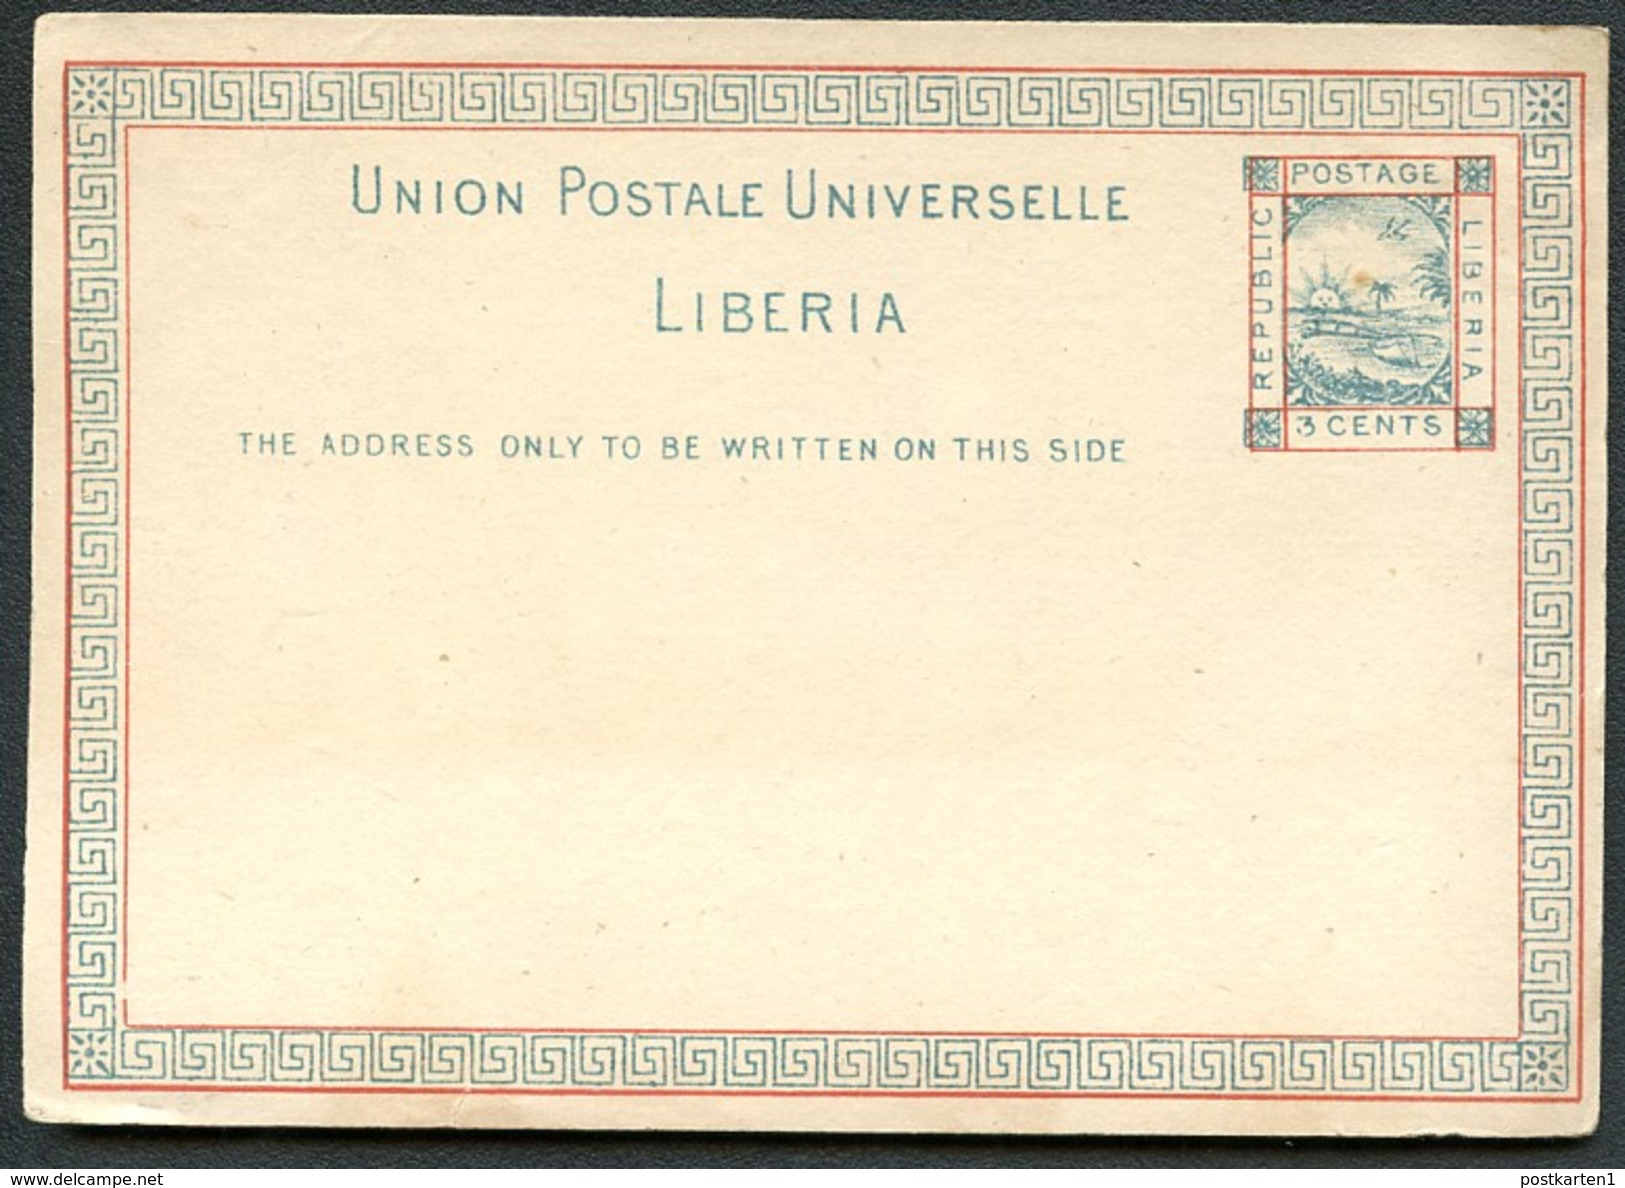 LIBERIA Postal Card #1 Mint Vf 1882 - Liberia